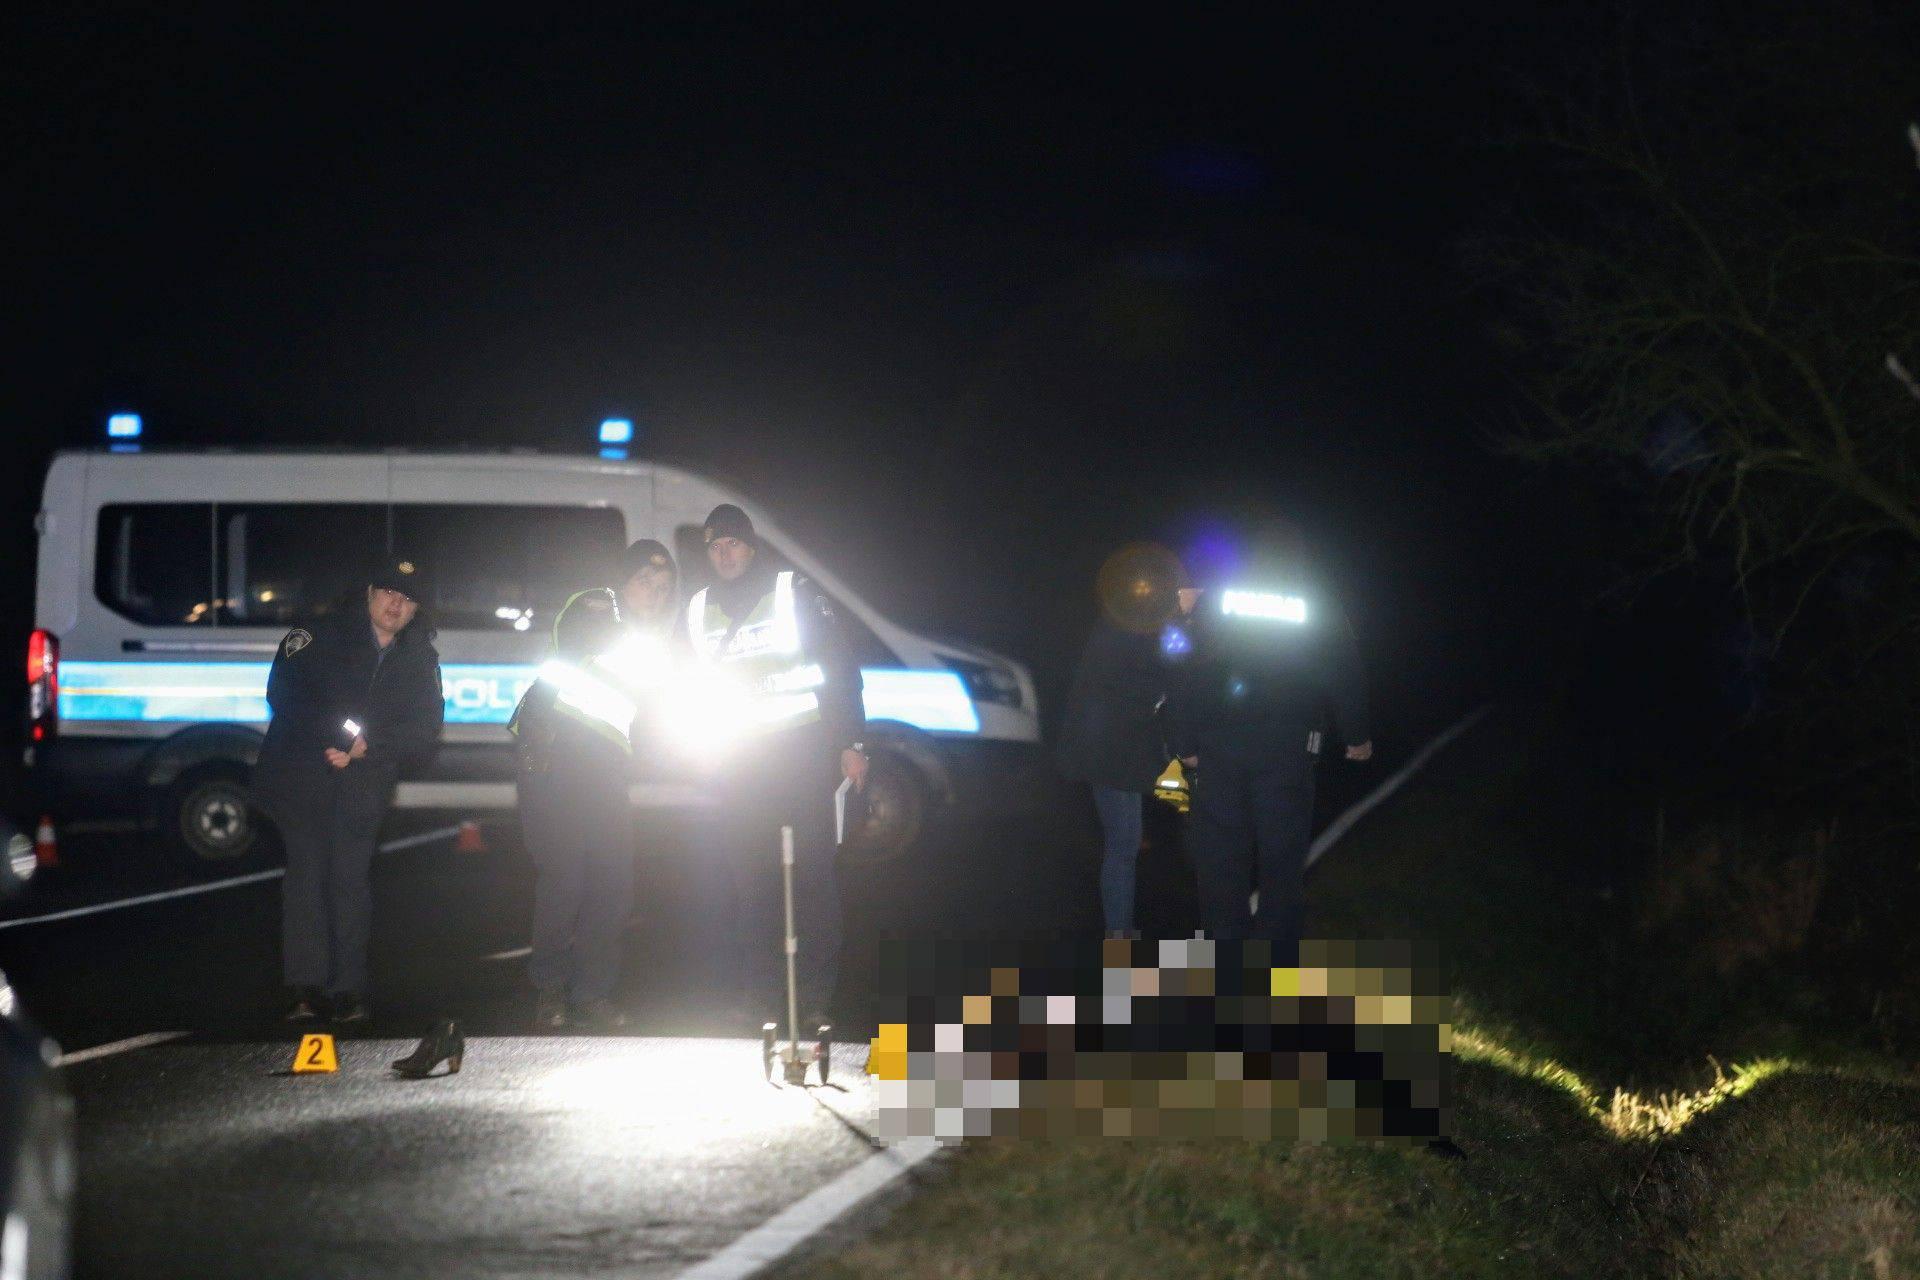 Vozač koji je jučer pregazio pješakinju vozio je VW Passat